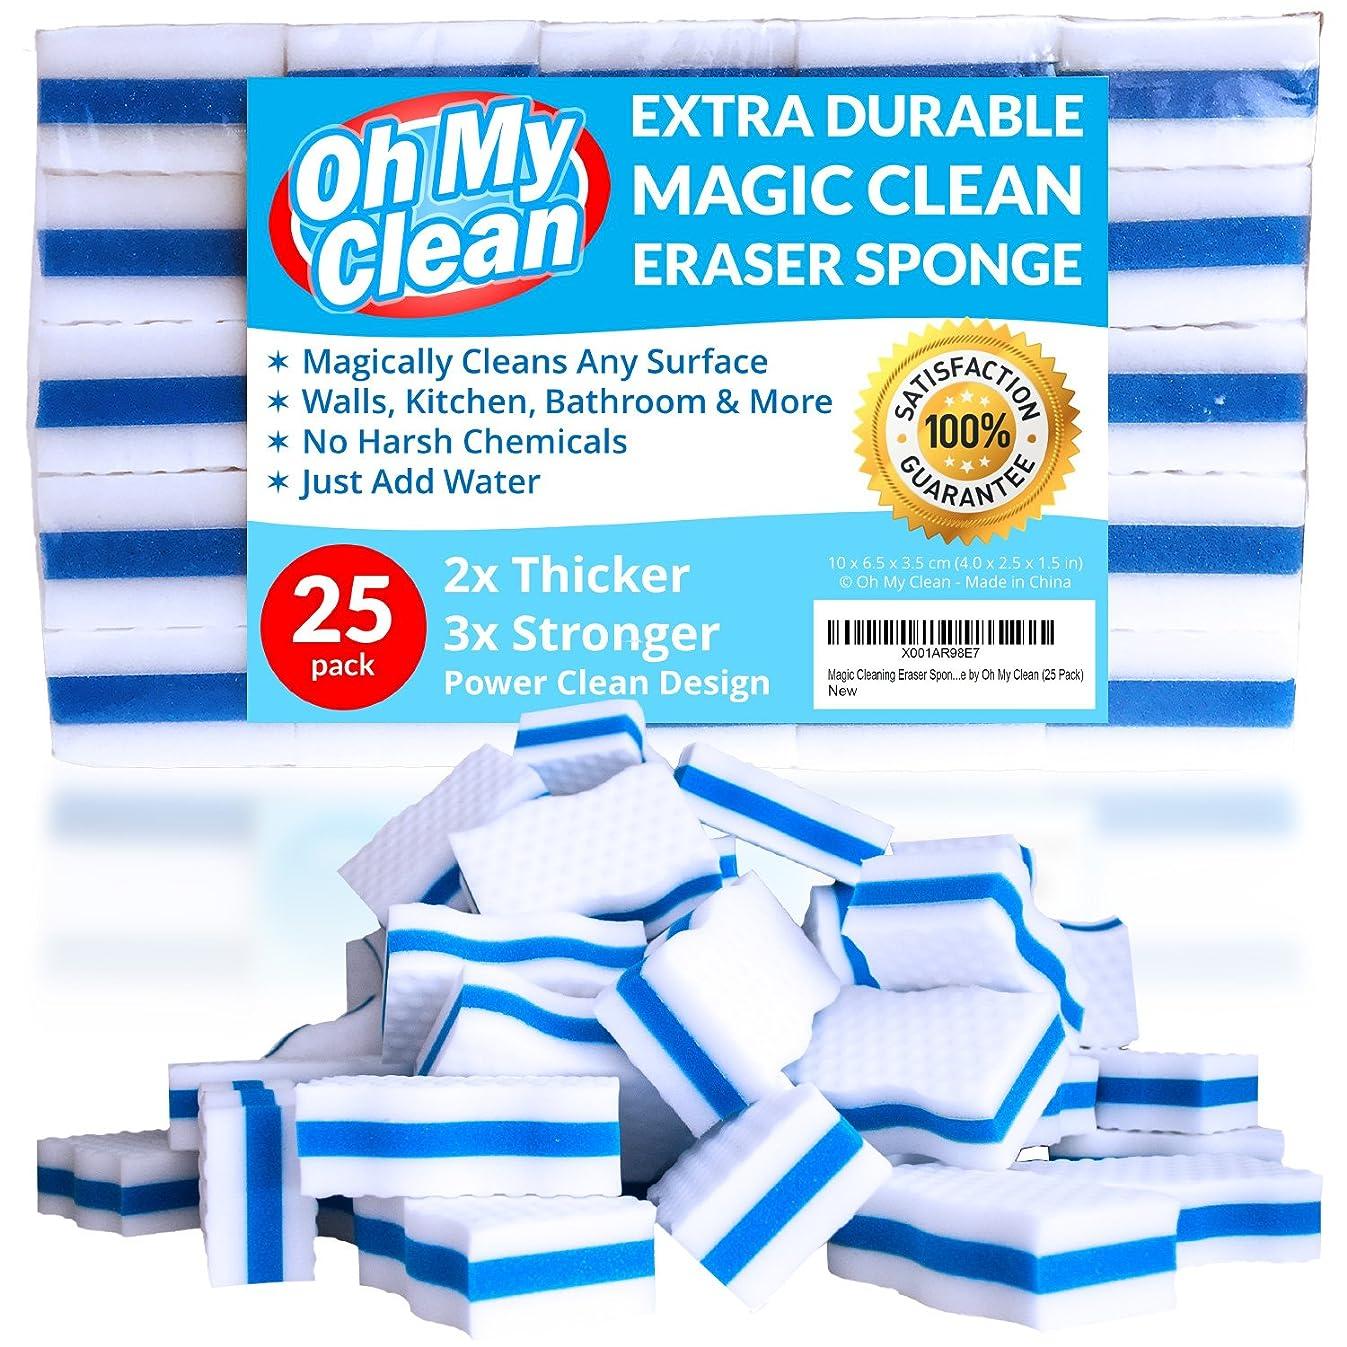 (25 Pack) Extra Durable Magic Cleaning Eraser Sponge - 2X Thick, 3X Stronger Melamine Sponges in Bulk - Multi Surface Power Scrubber Foam Pads - Bathtub, Floor, Baseboard, Bathroom, Wall Cleaner